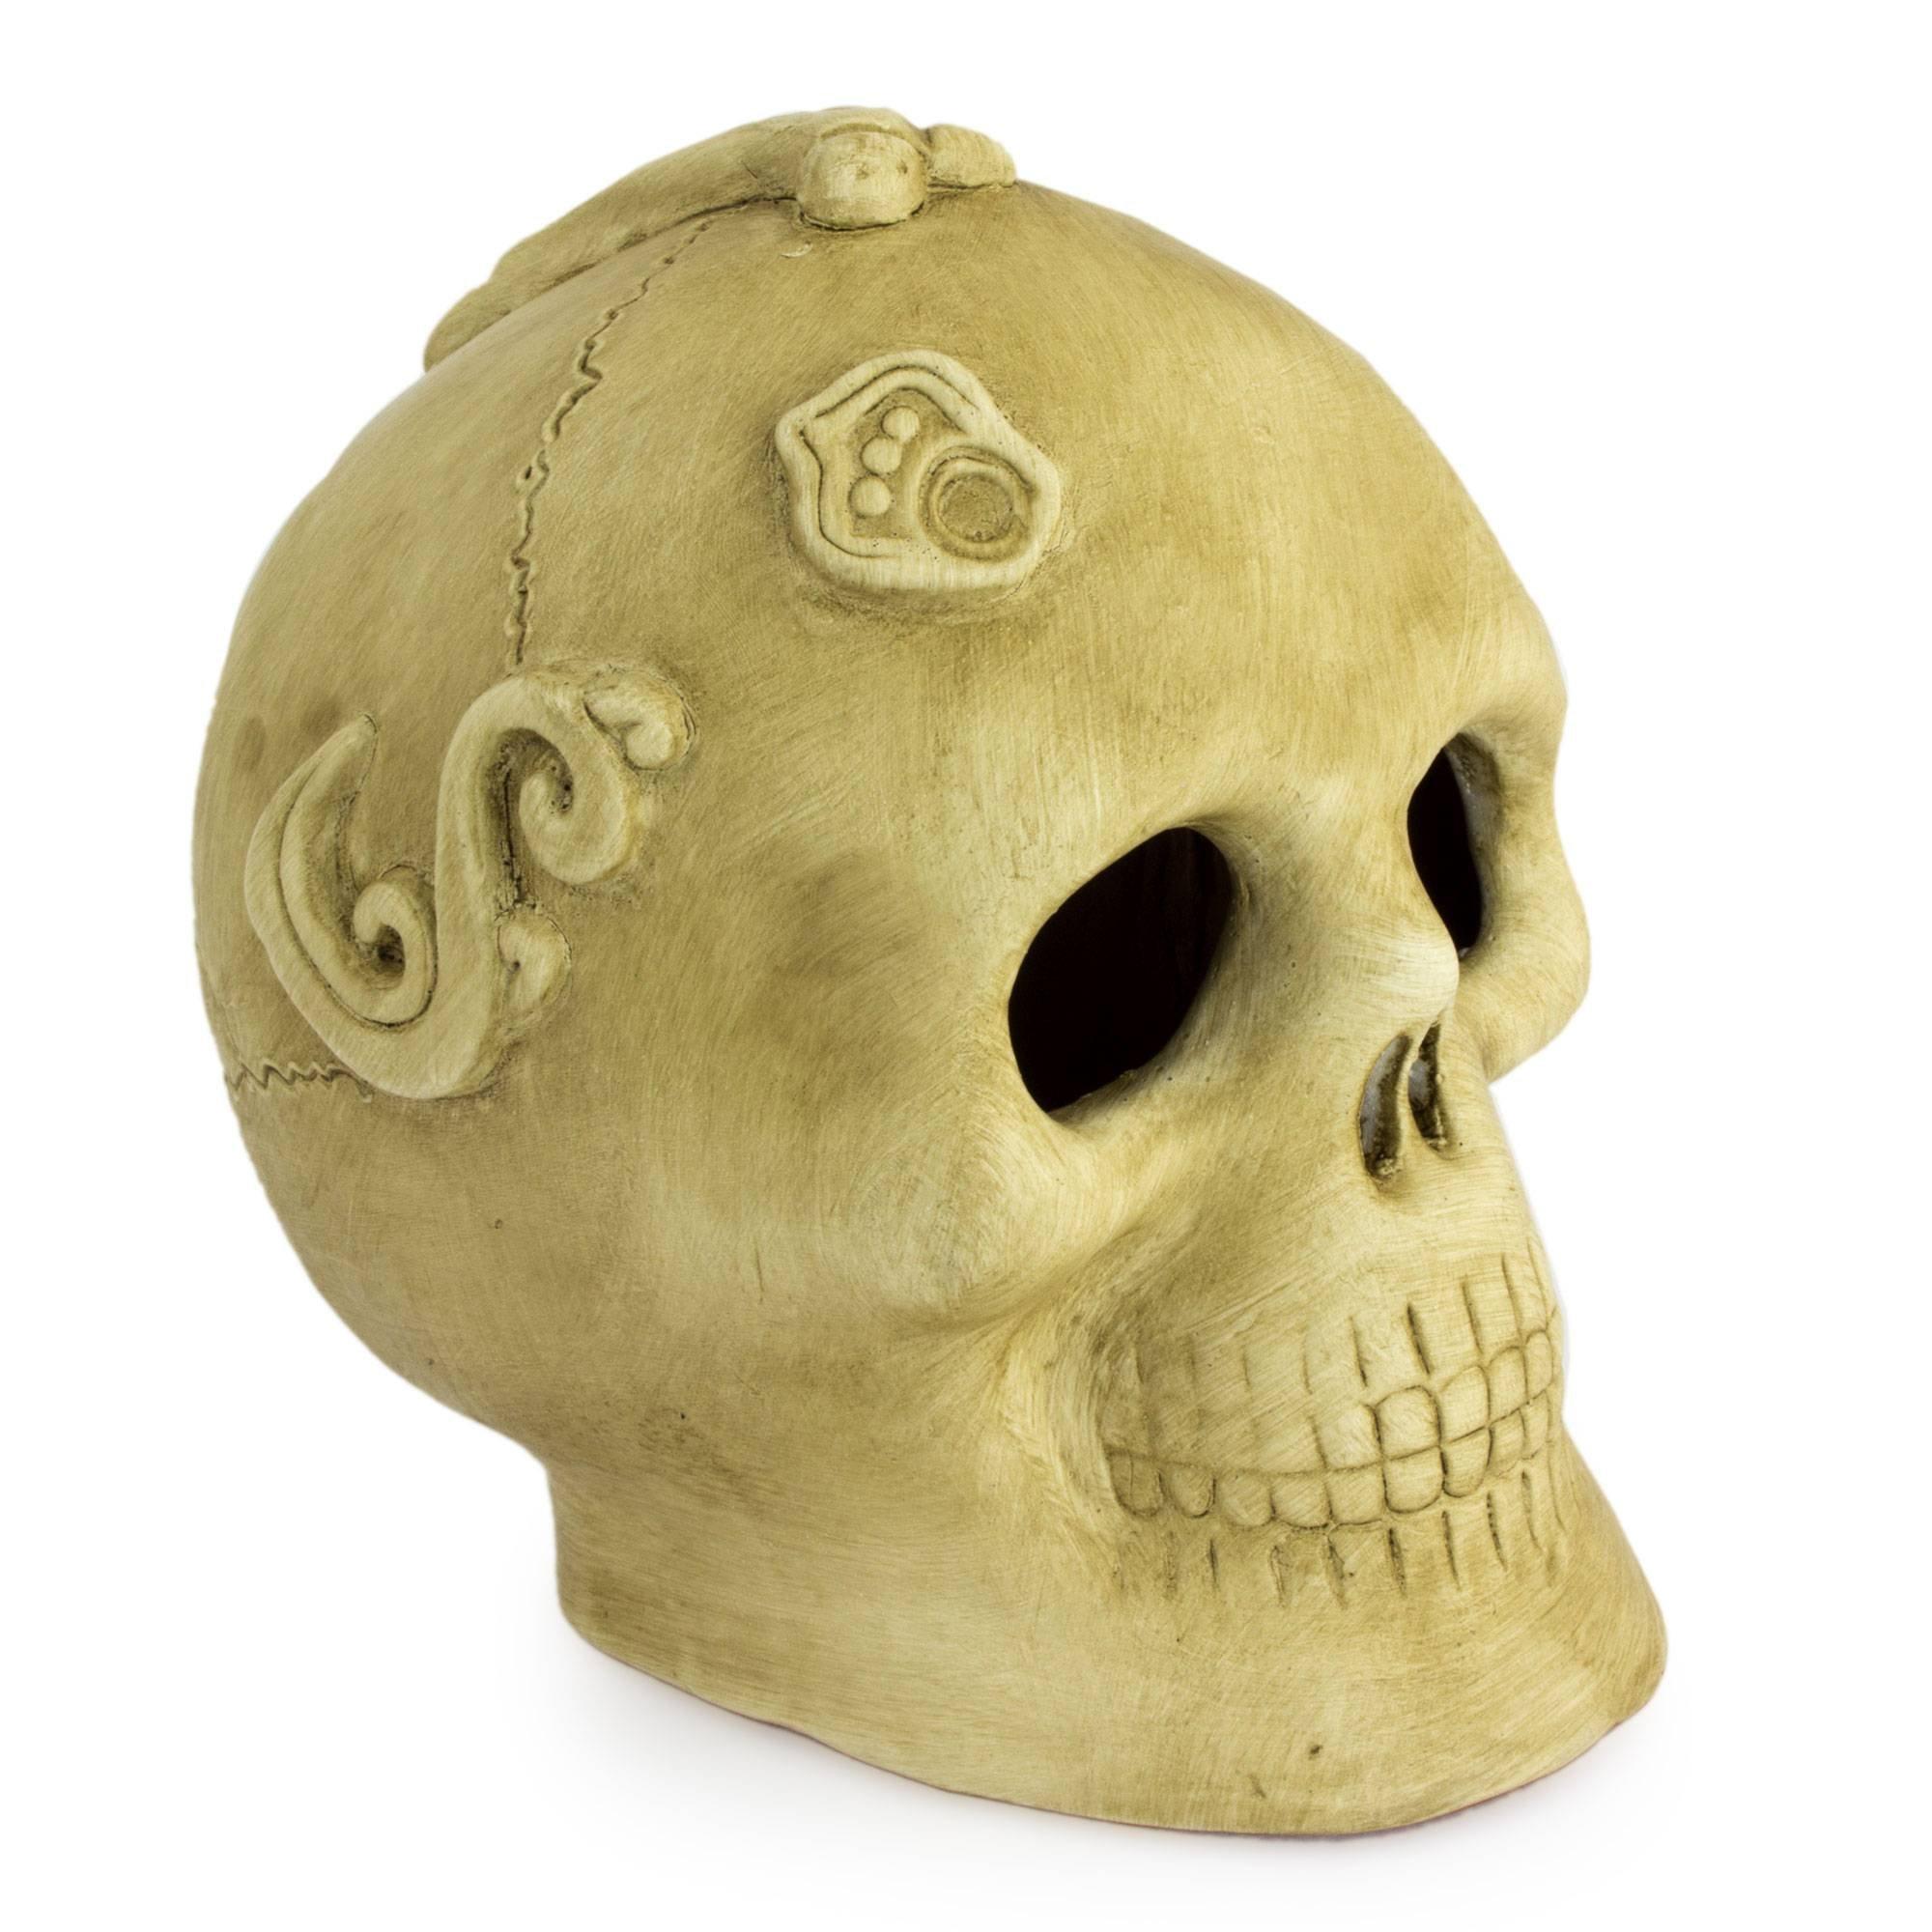 NOVICA Beige Skull Ceramic Figurine, 6'' Tall, Ivory Offering'